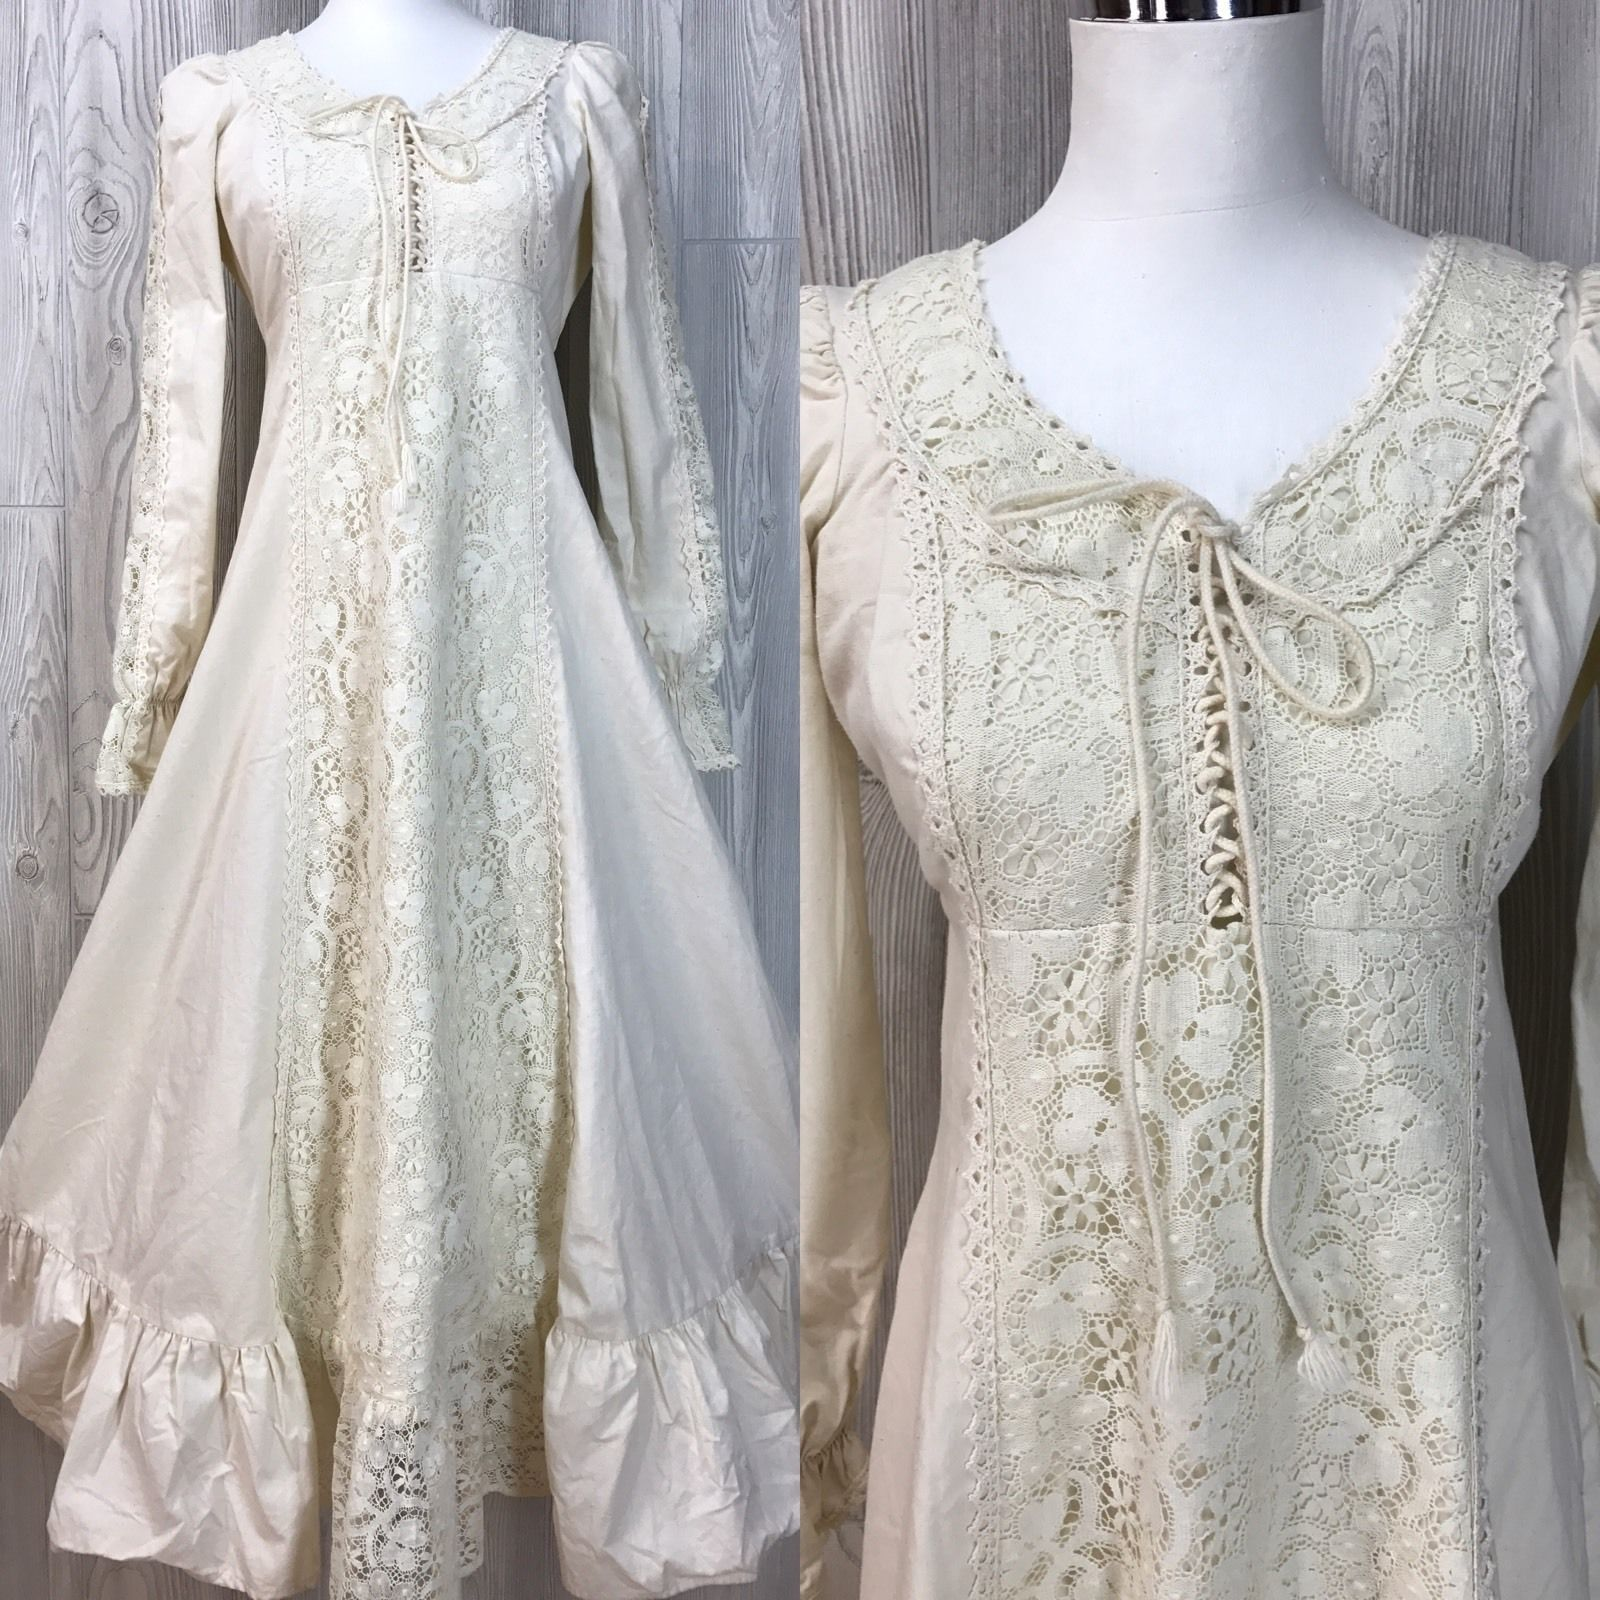 Vtg womens dress us hippy muslin lace gunne sax wedding dress